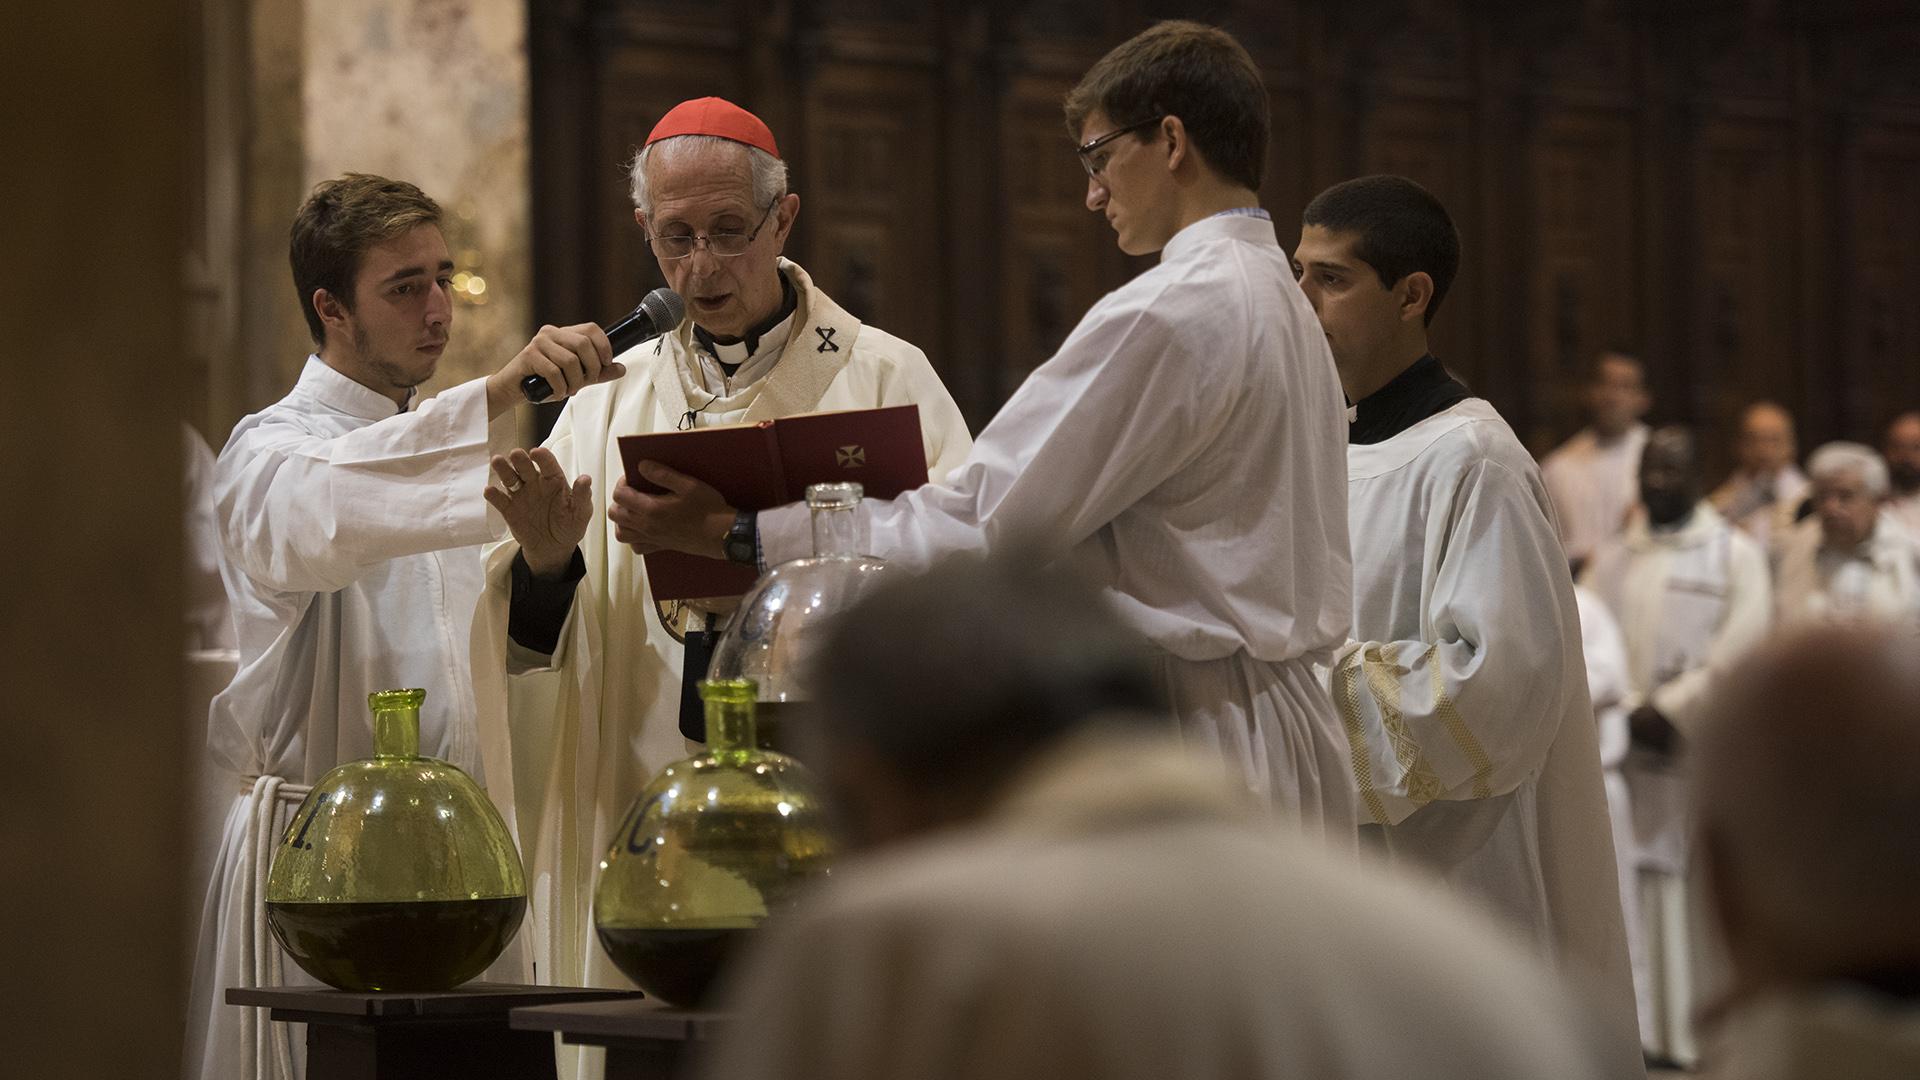 El cardenal encabezó la Misa Crismal